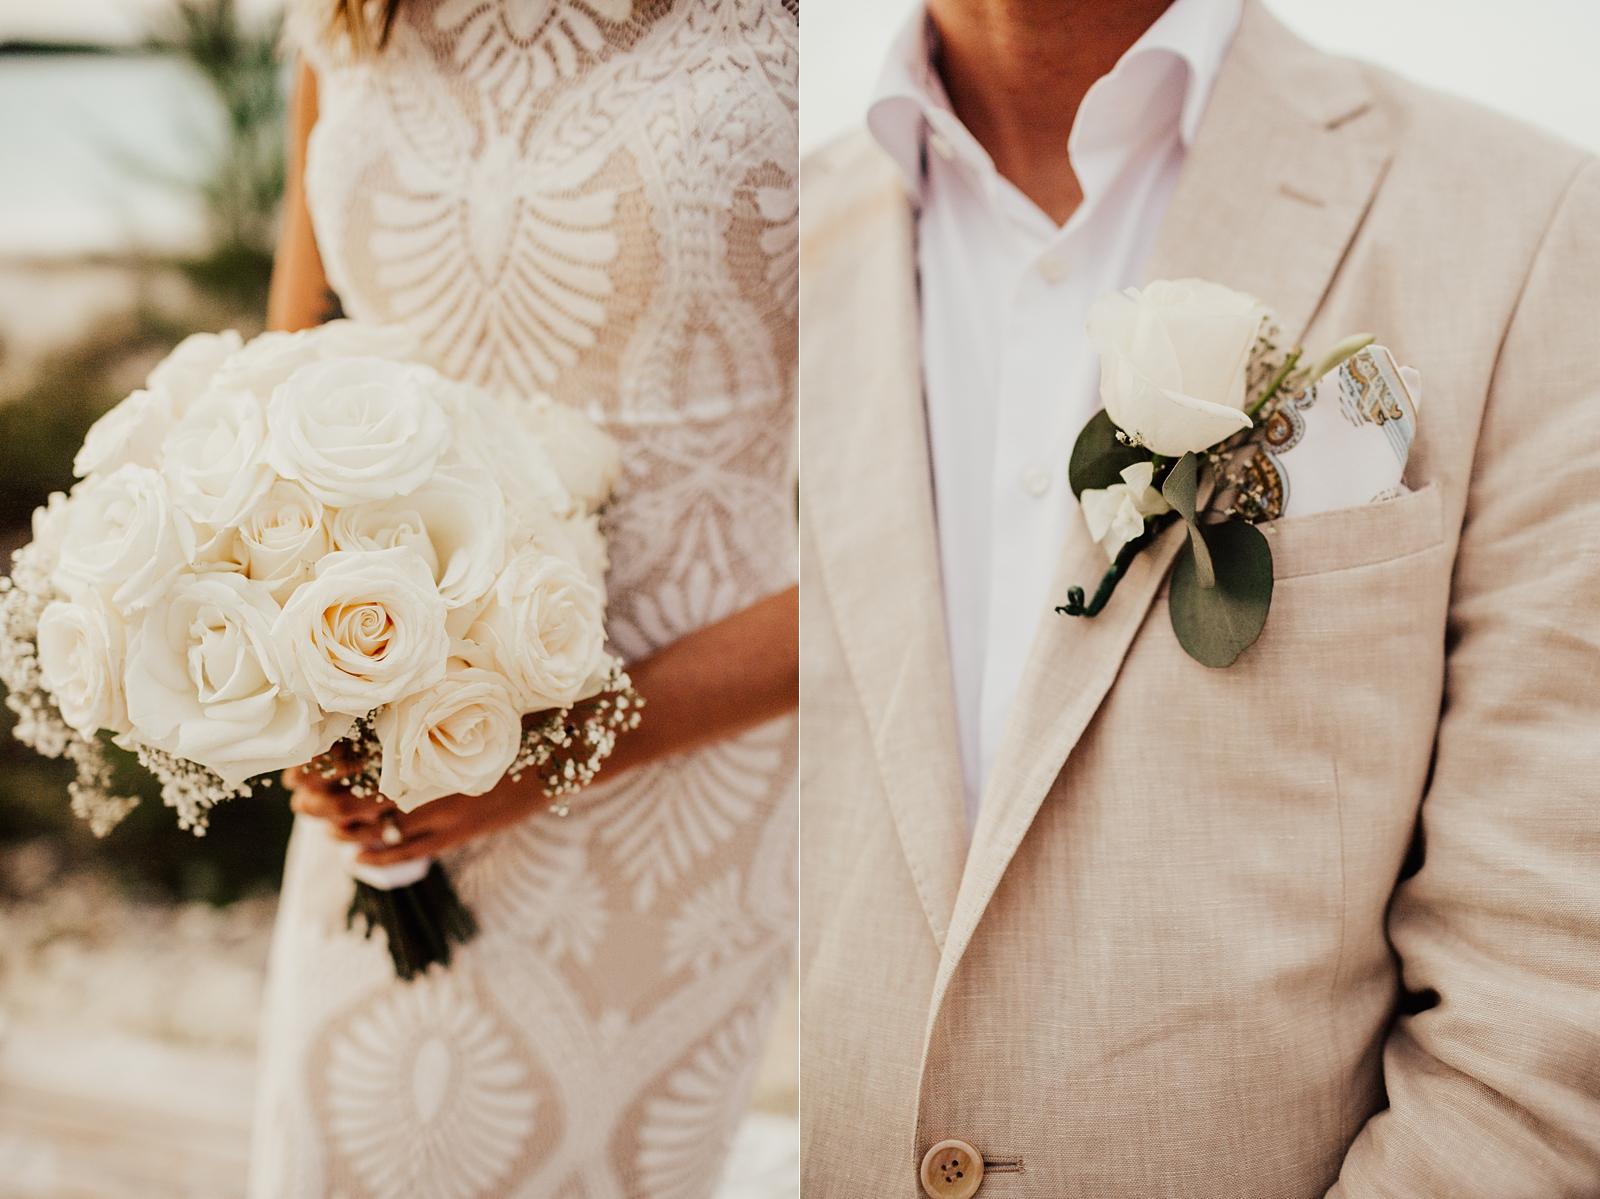 Jenni & Andrew Intimate Beach Destination Wedding in Little Exuma, Bahamas_0532.jpg